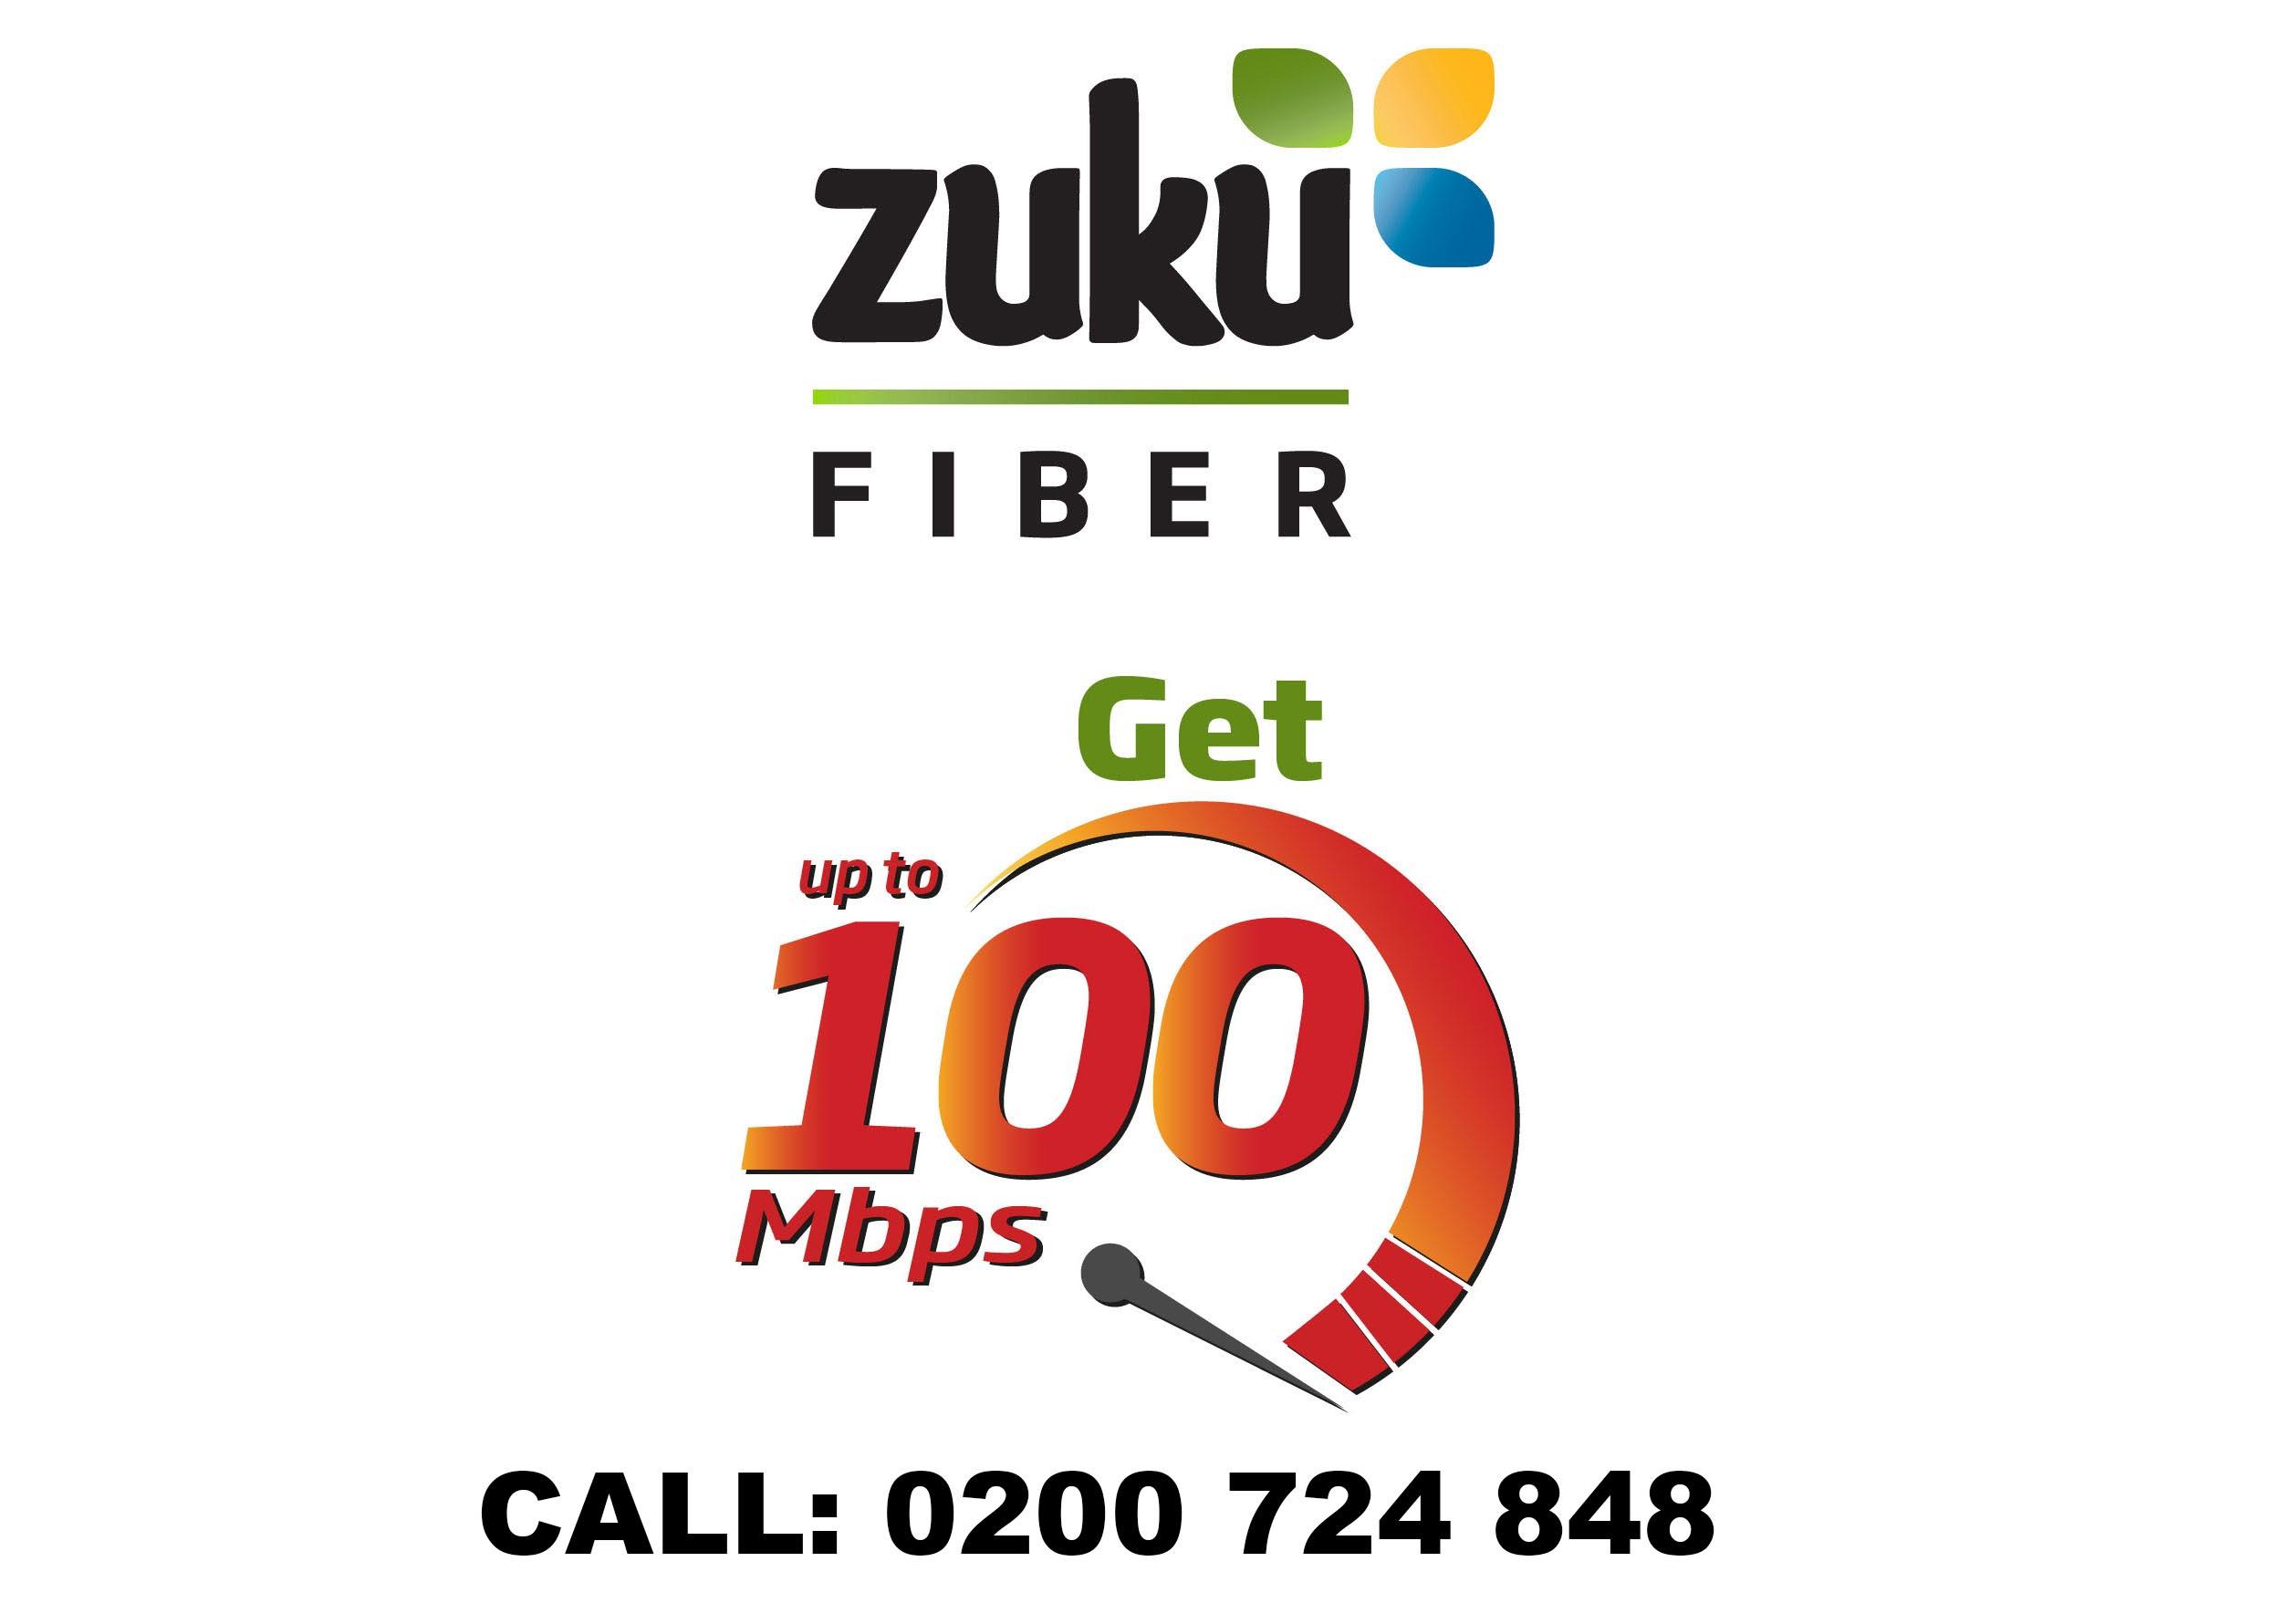 How to Pay – Zuku